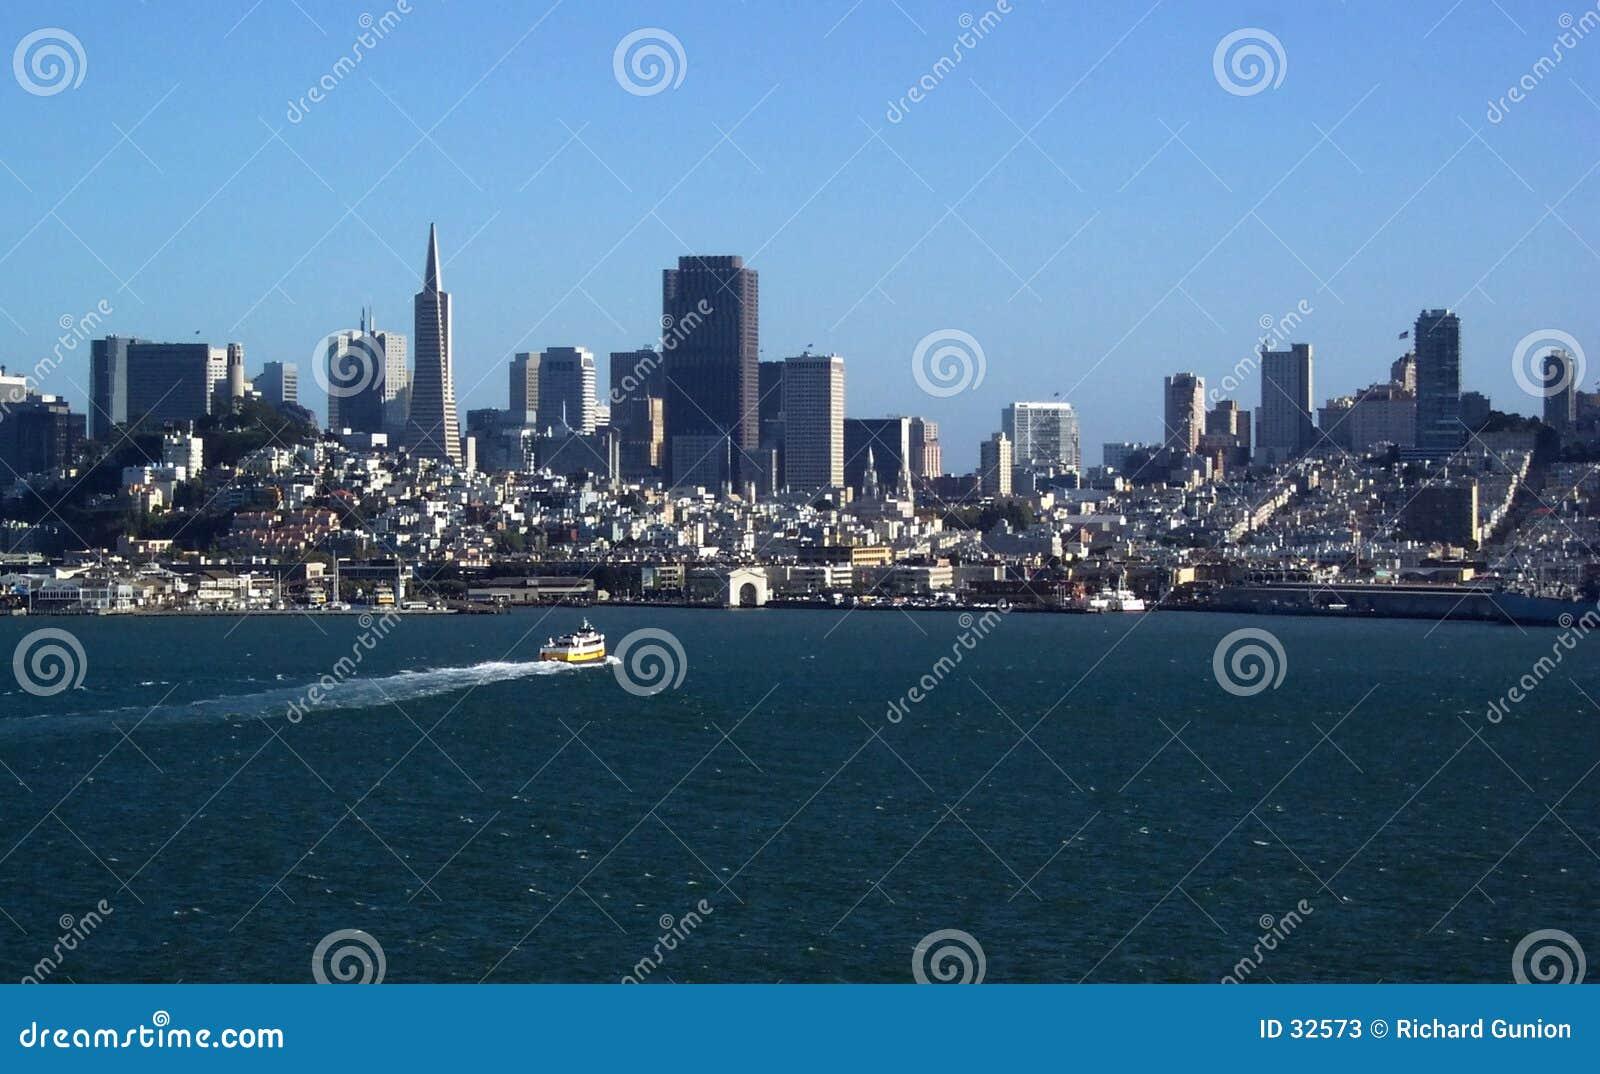 San- Francisco BaySkyline